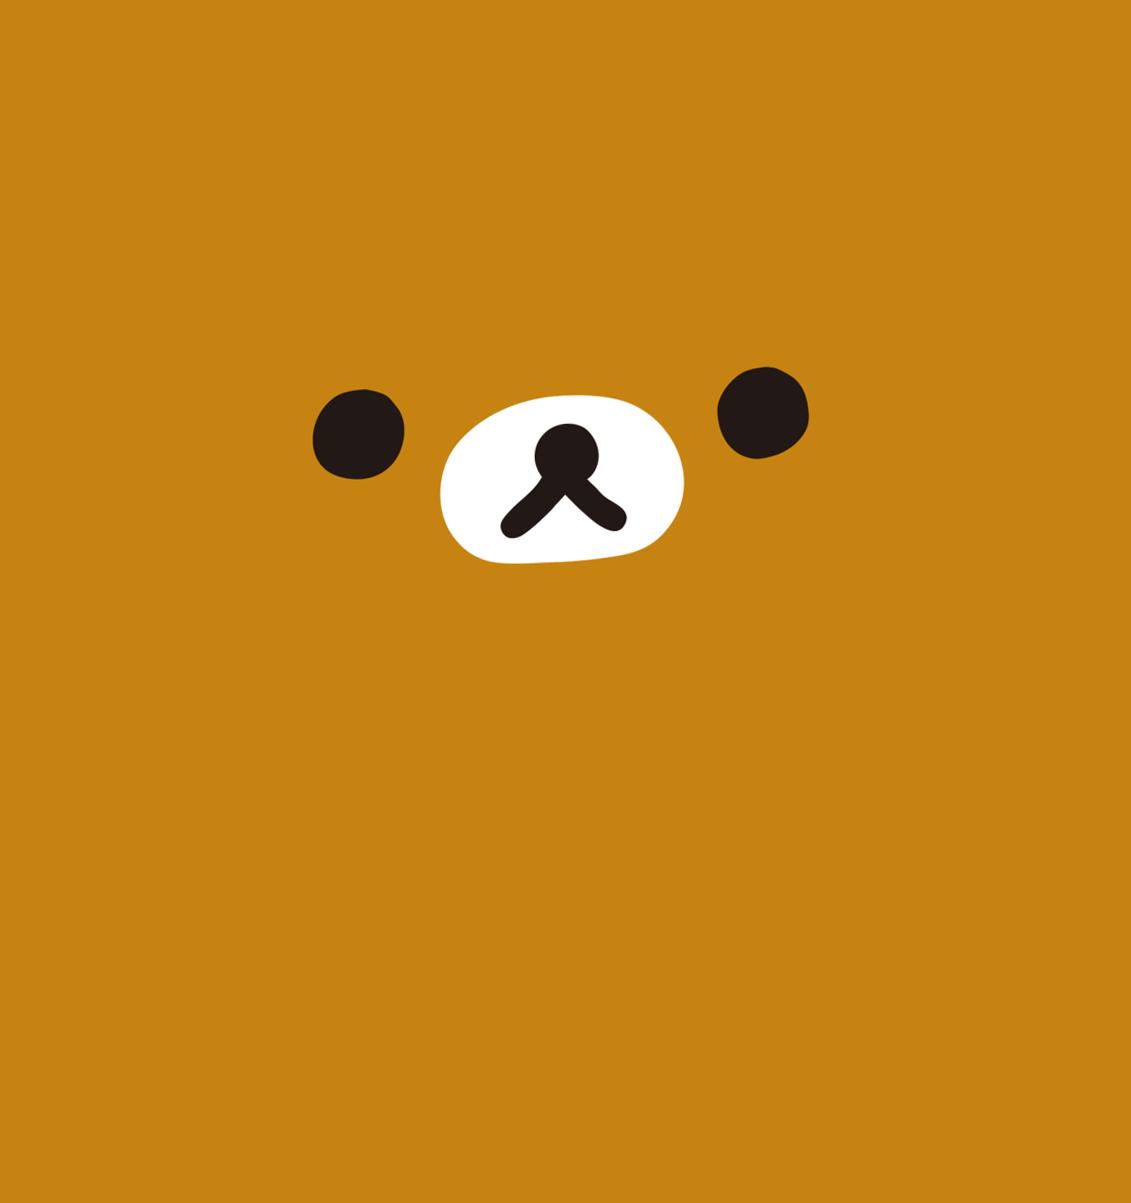 Orange Bear Face Nose Eyes Wallpaper HD - Bear Face PNG HD